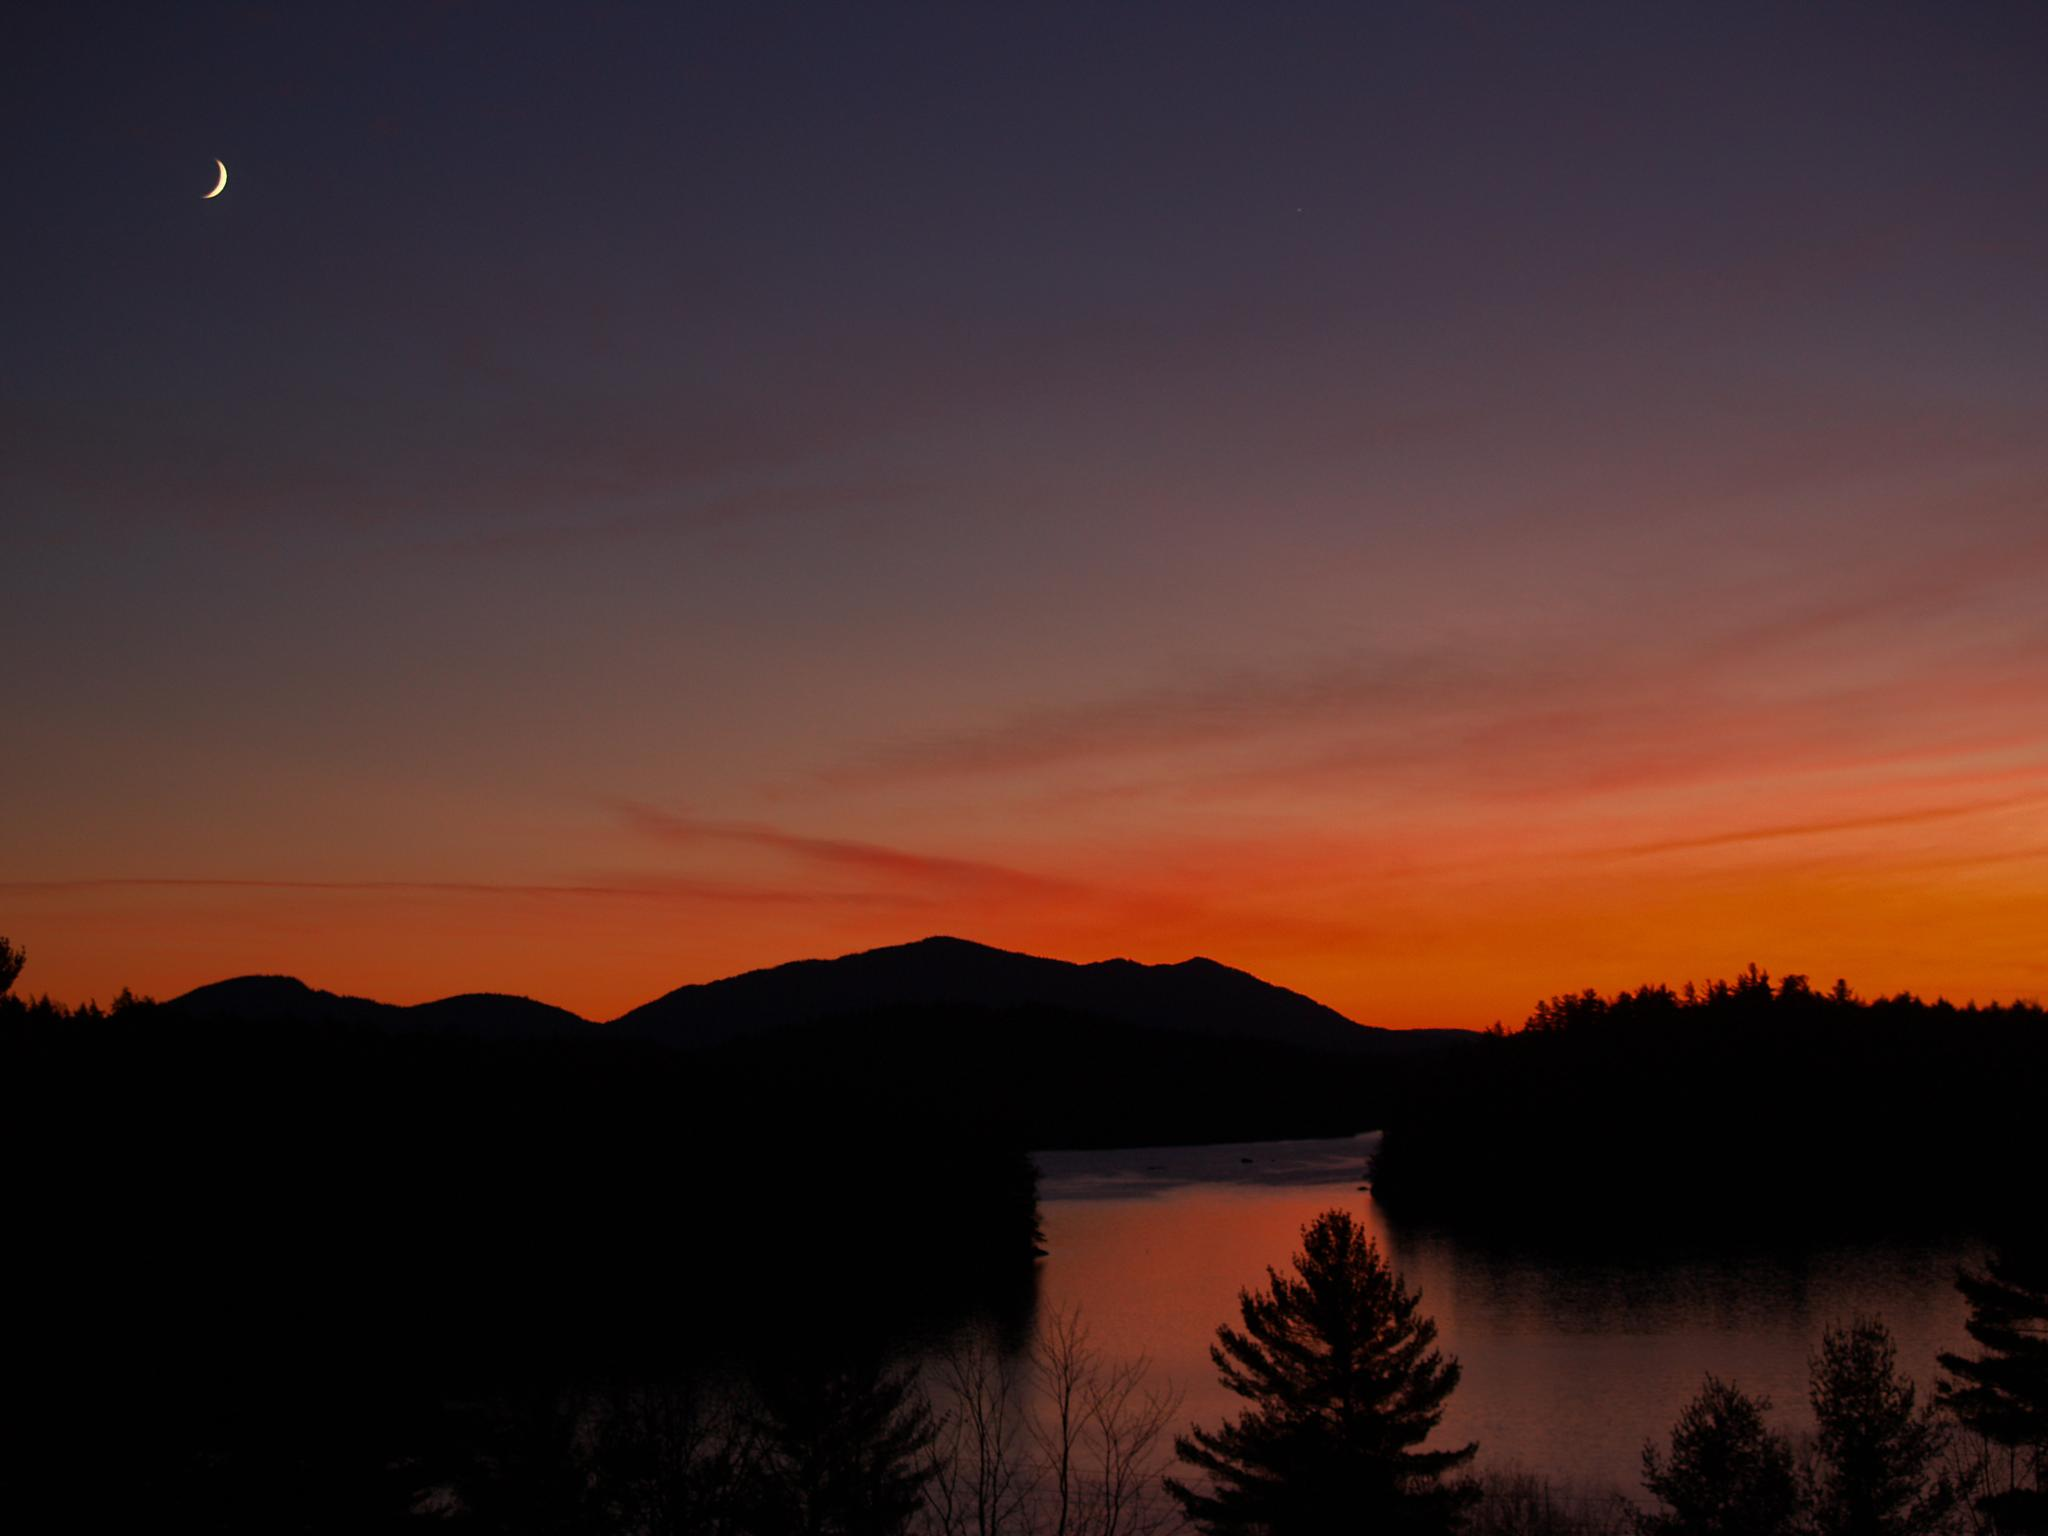 Lower Saranac sunset by ADKPhotoTaker